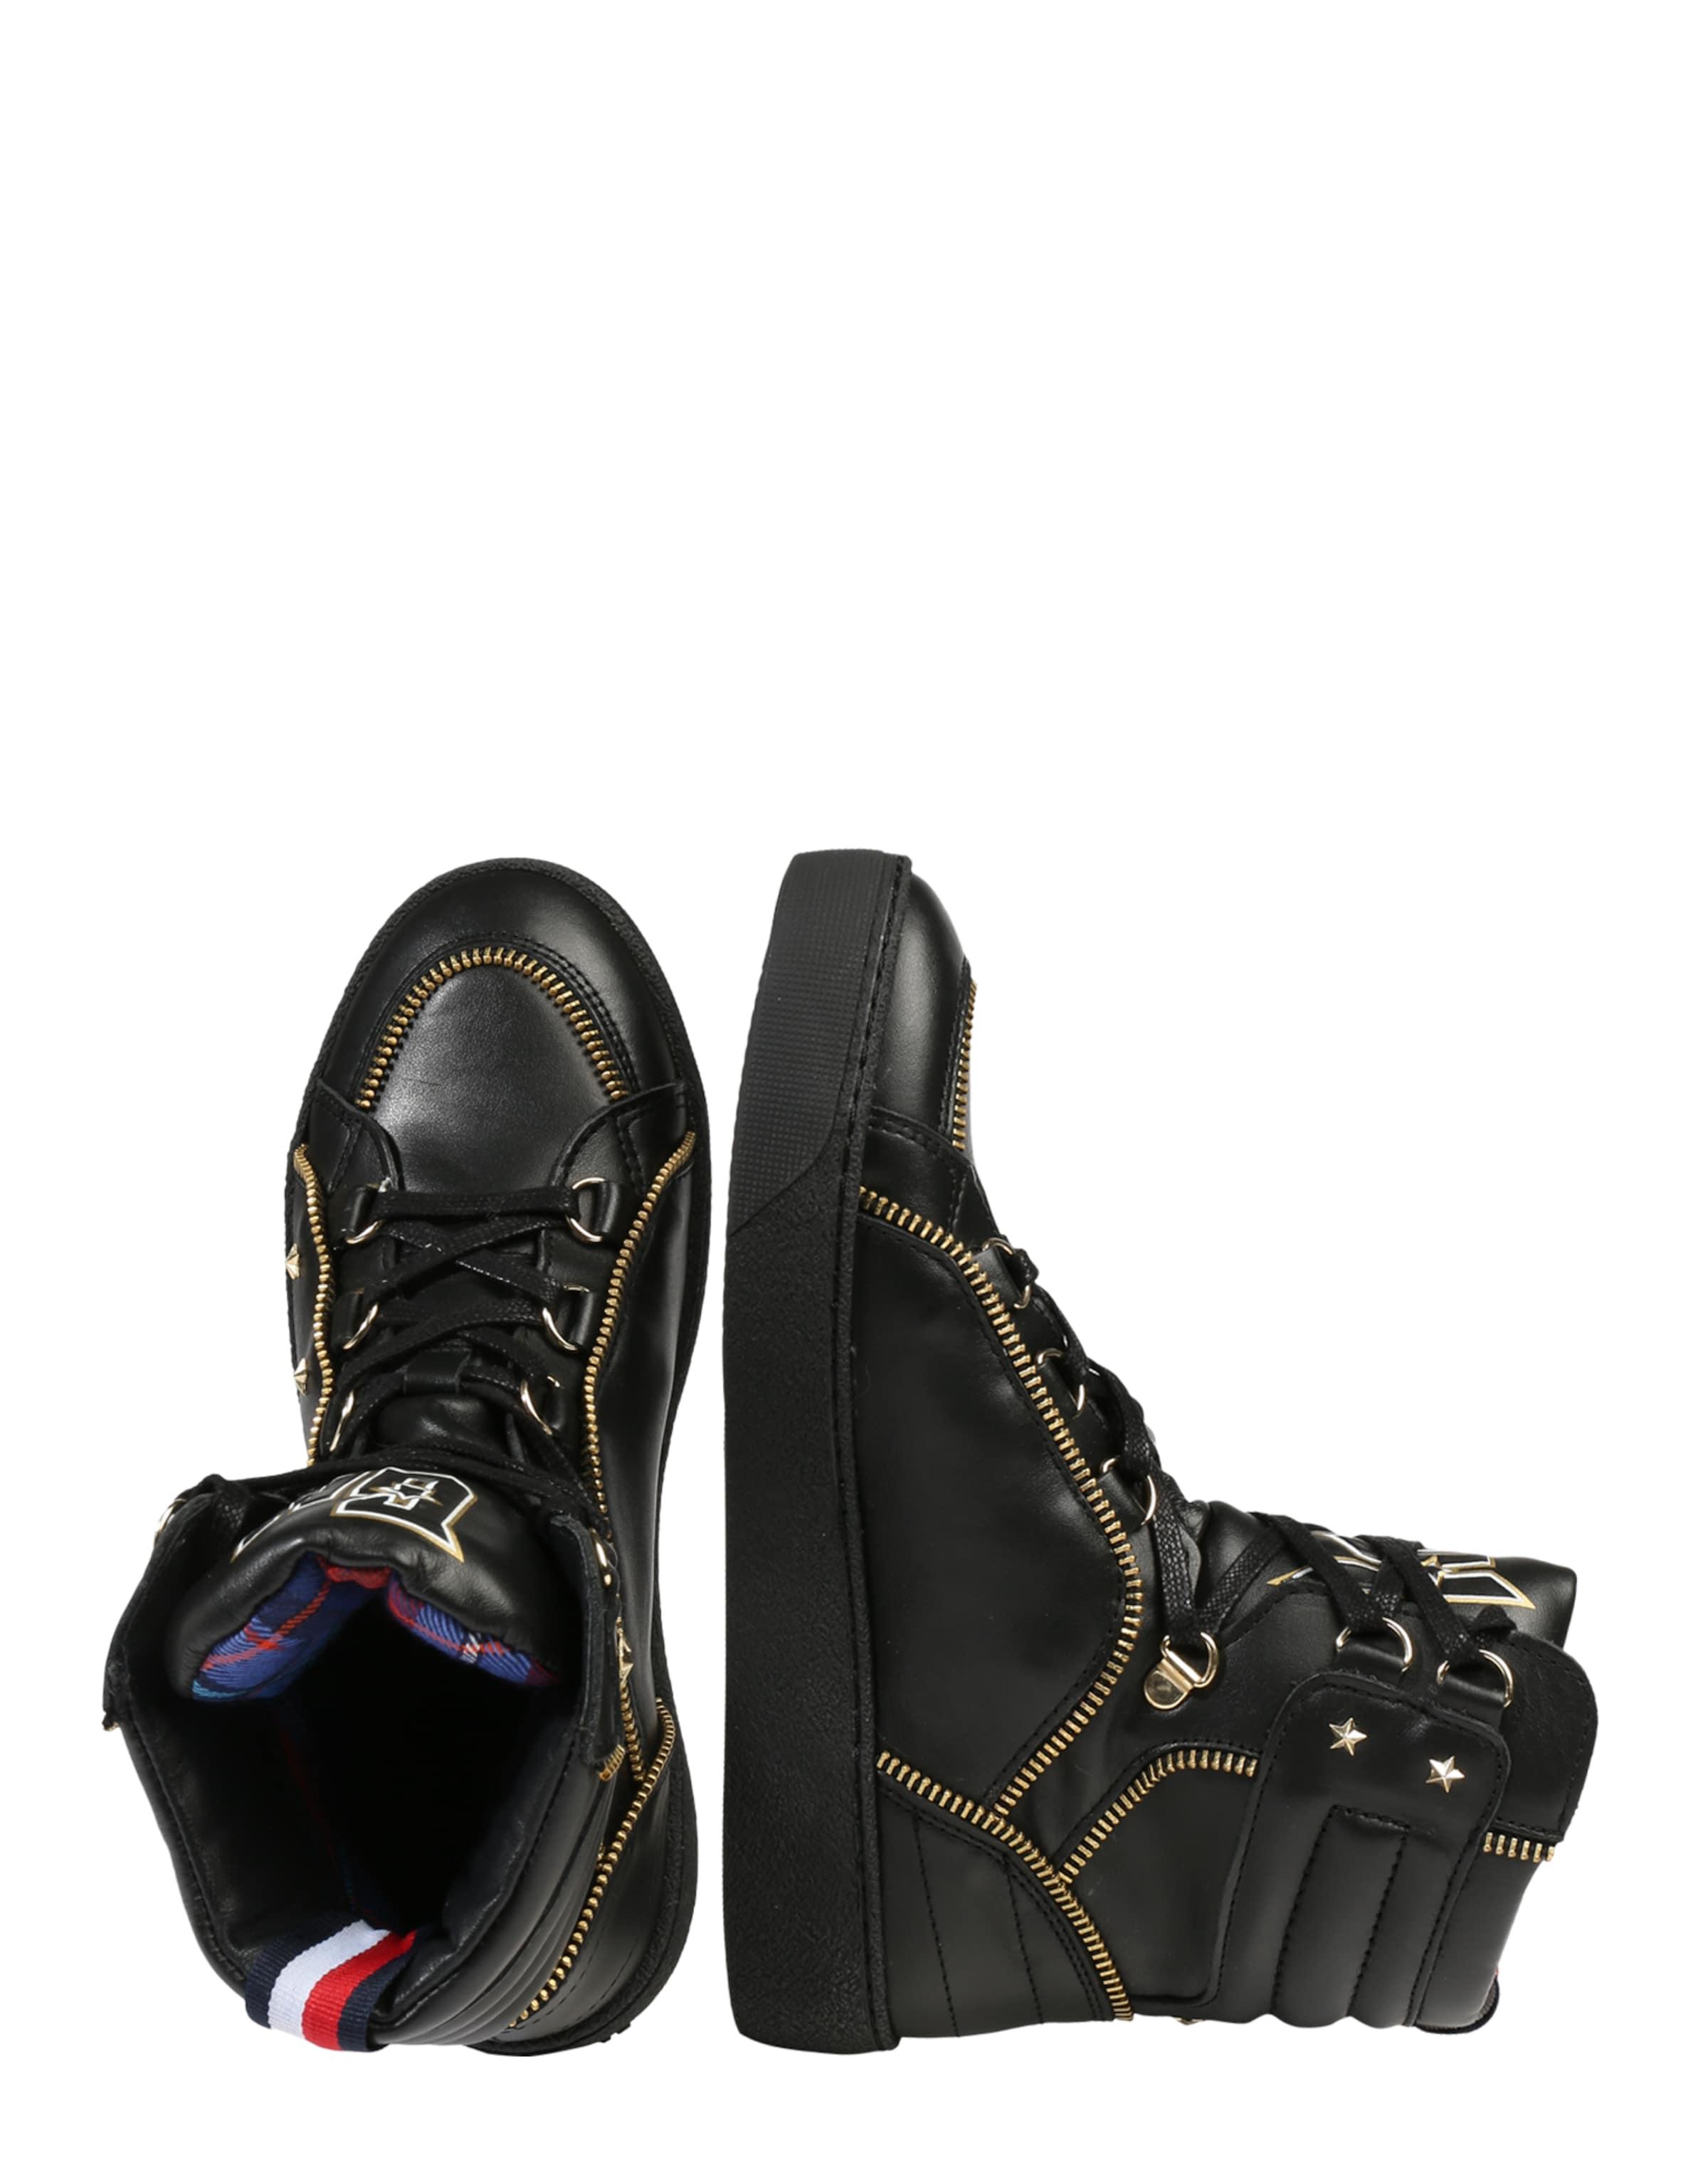 TOMMY HILFIGER Sneaker 'Gigi Hadid' Rabatt Mit Paypal V9bc8LMVp9